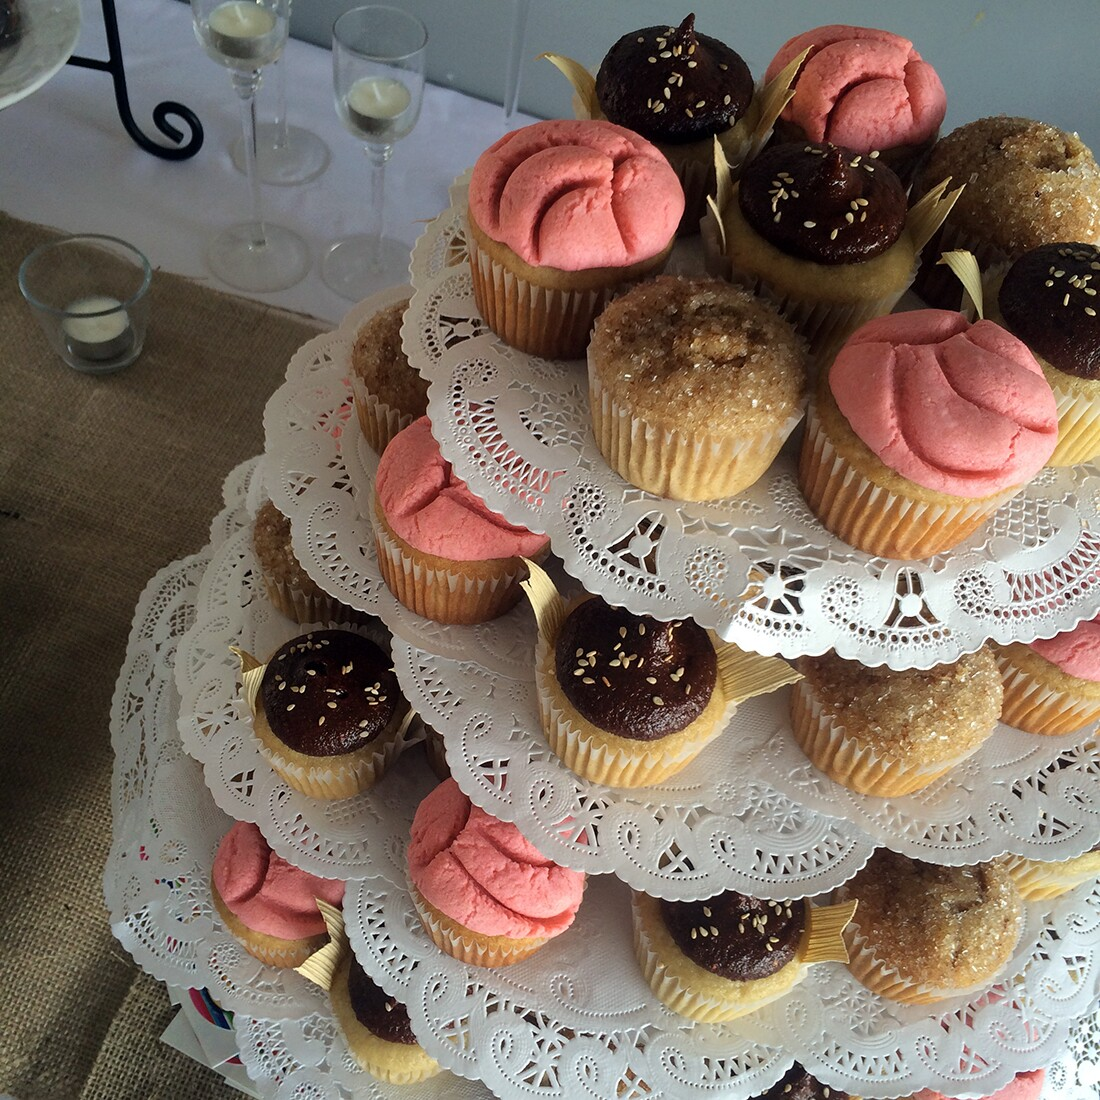 Concha, tamal de mole, and churro con cajeta cupcakes | Courtesy of Viva Los Cupcakes